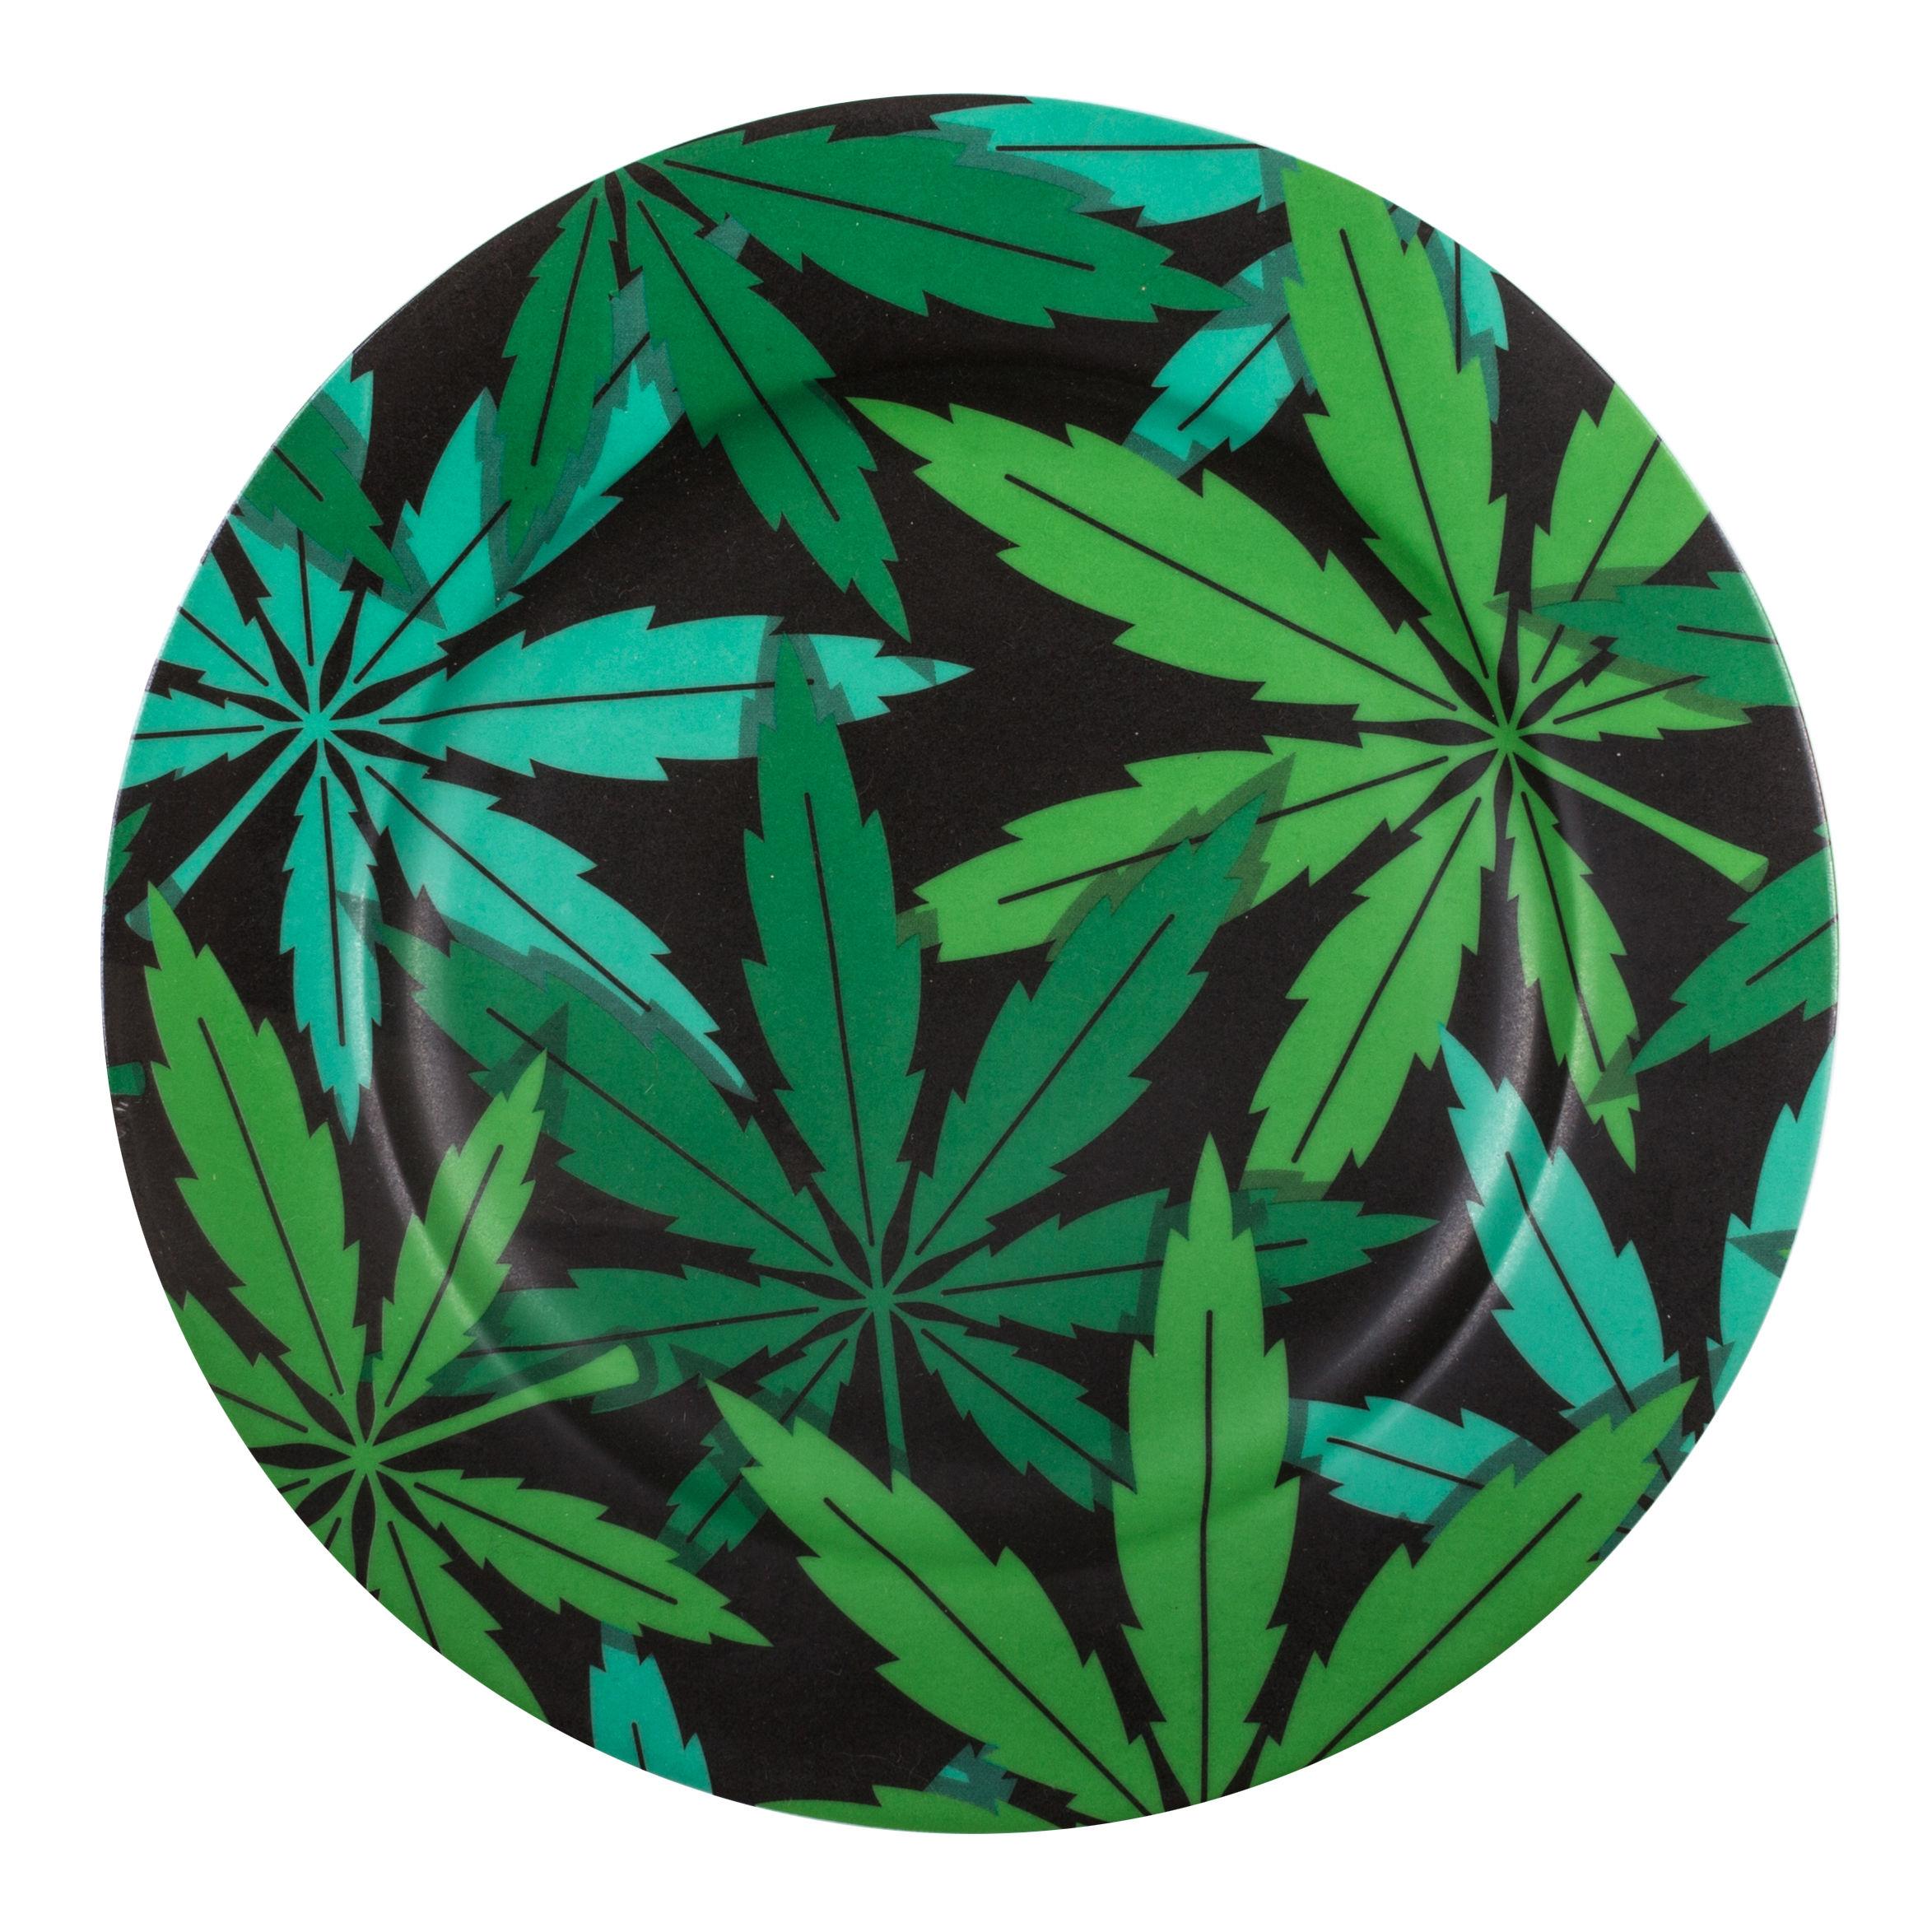 Tableware - Plates - Weed Plate - / China - Ø 27 cm by Seletti - Hemp - China